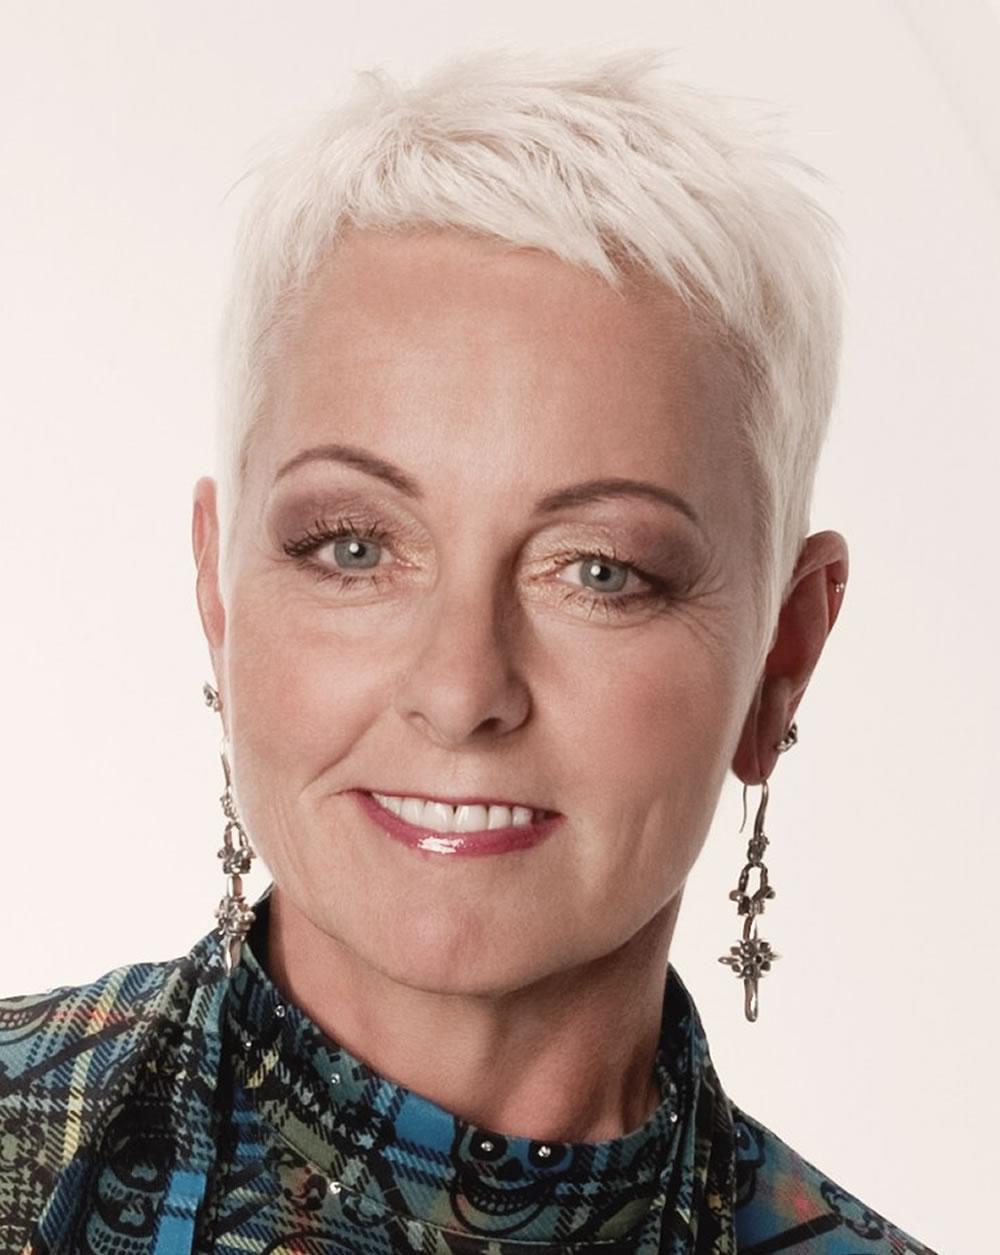 Best Short Hairstyles For Older Women Over 45 Regarding Older Women Short Haircuts (View 22 of 25)